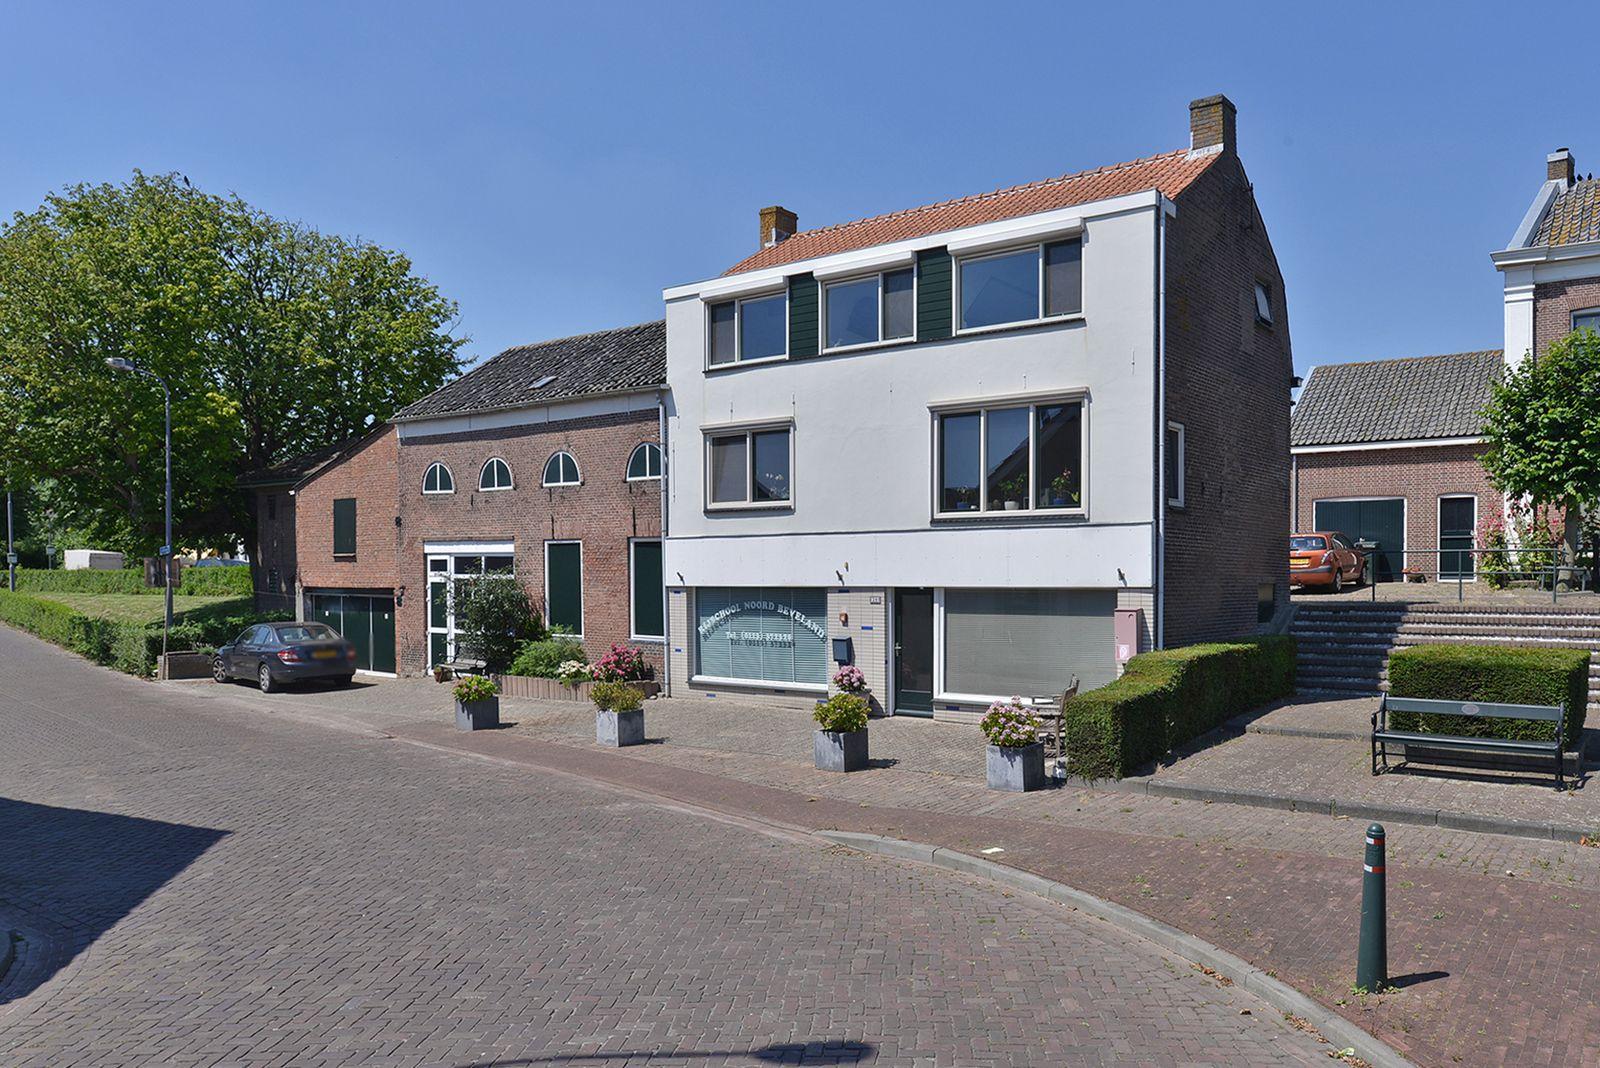 Noordeindstraat 30-32, Wissenkerke